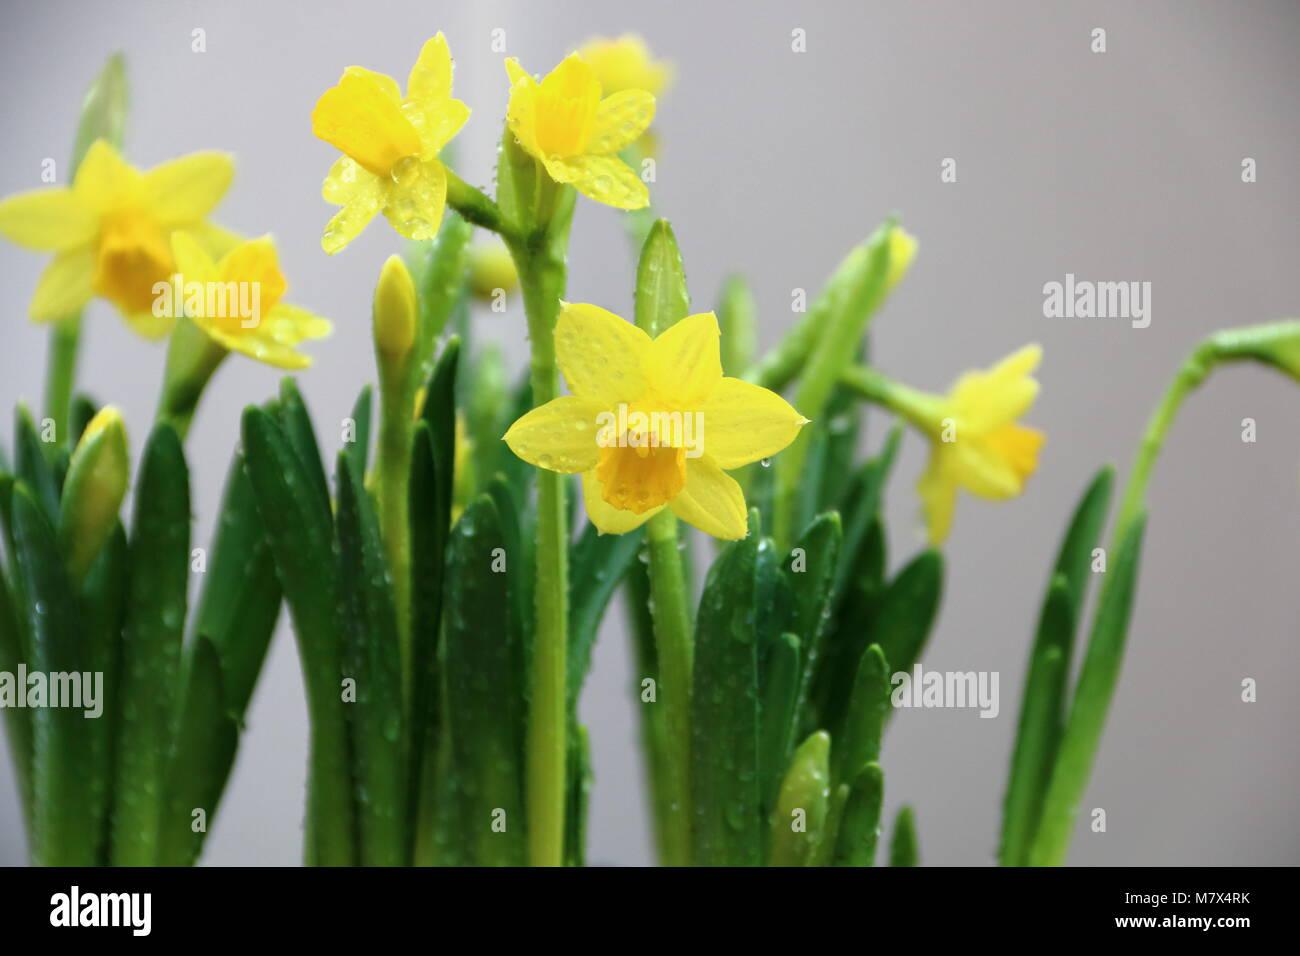 Narcisos Amarillos Narciso Tete A Tete Foto Imagen De Stock - Narcisos-amarillos